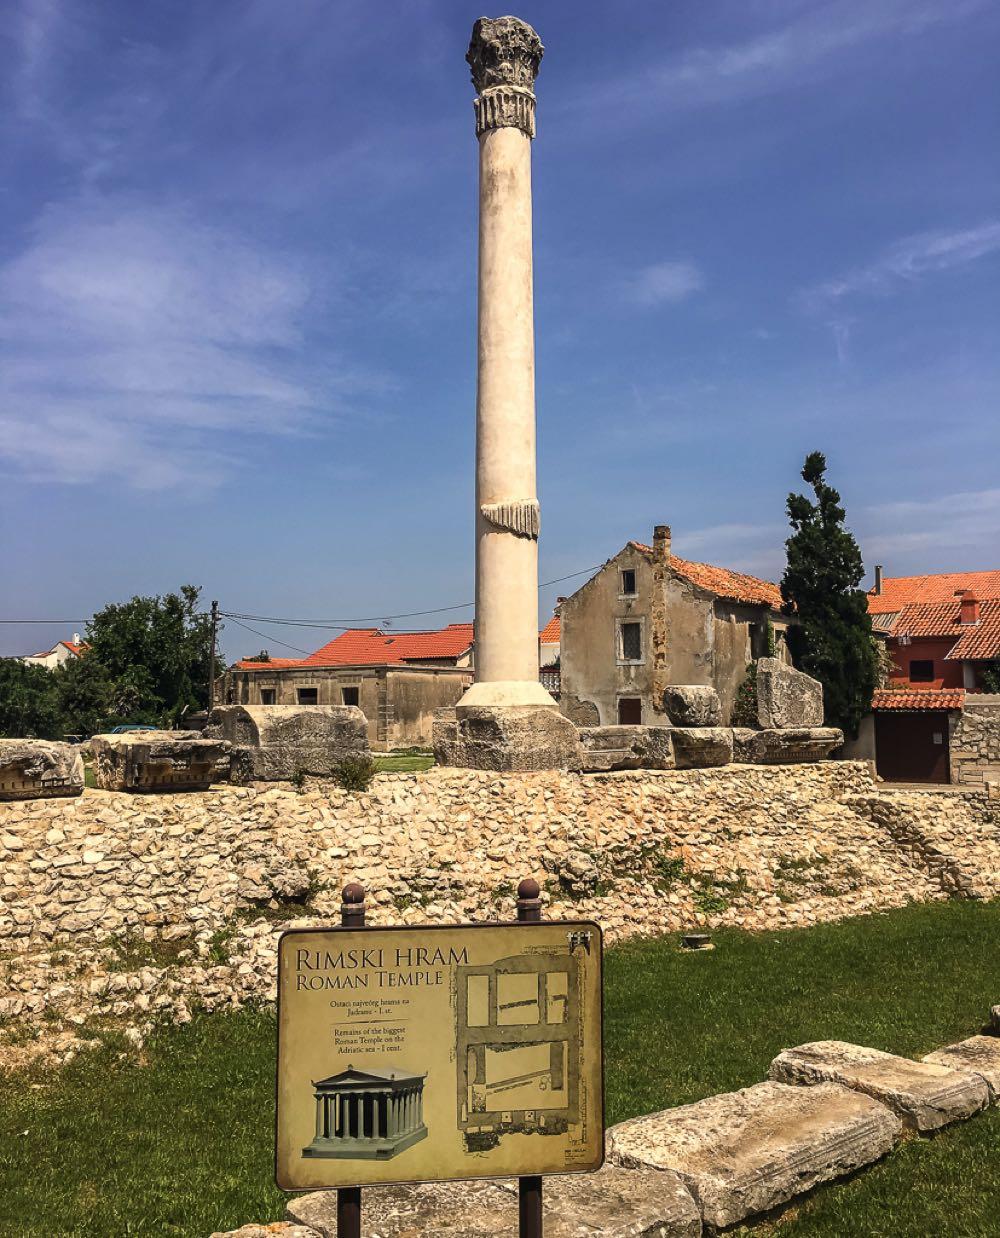 Rimski-Hram–Roman Temple-Nin